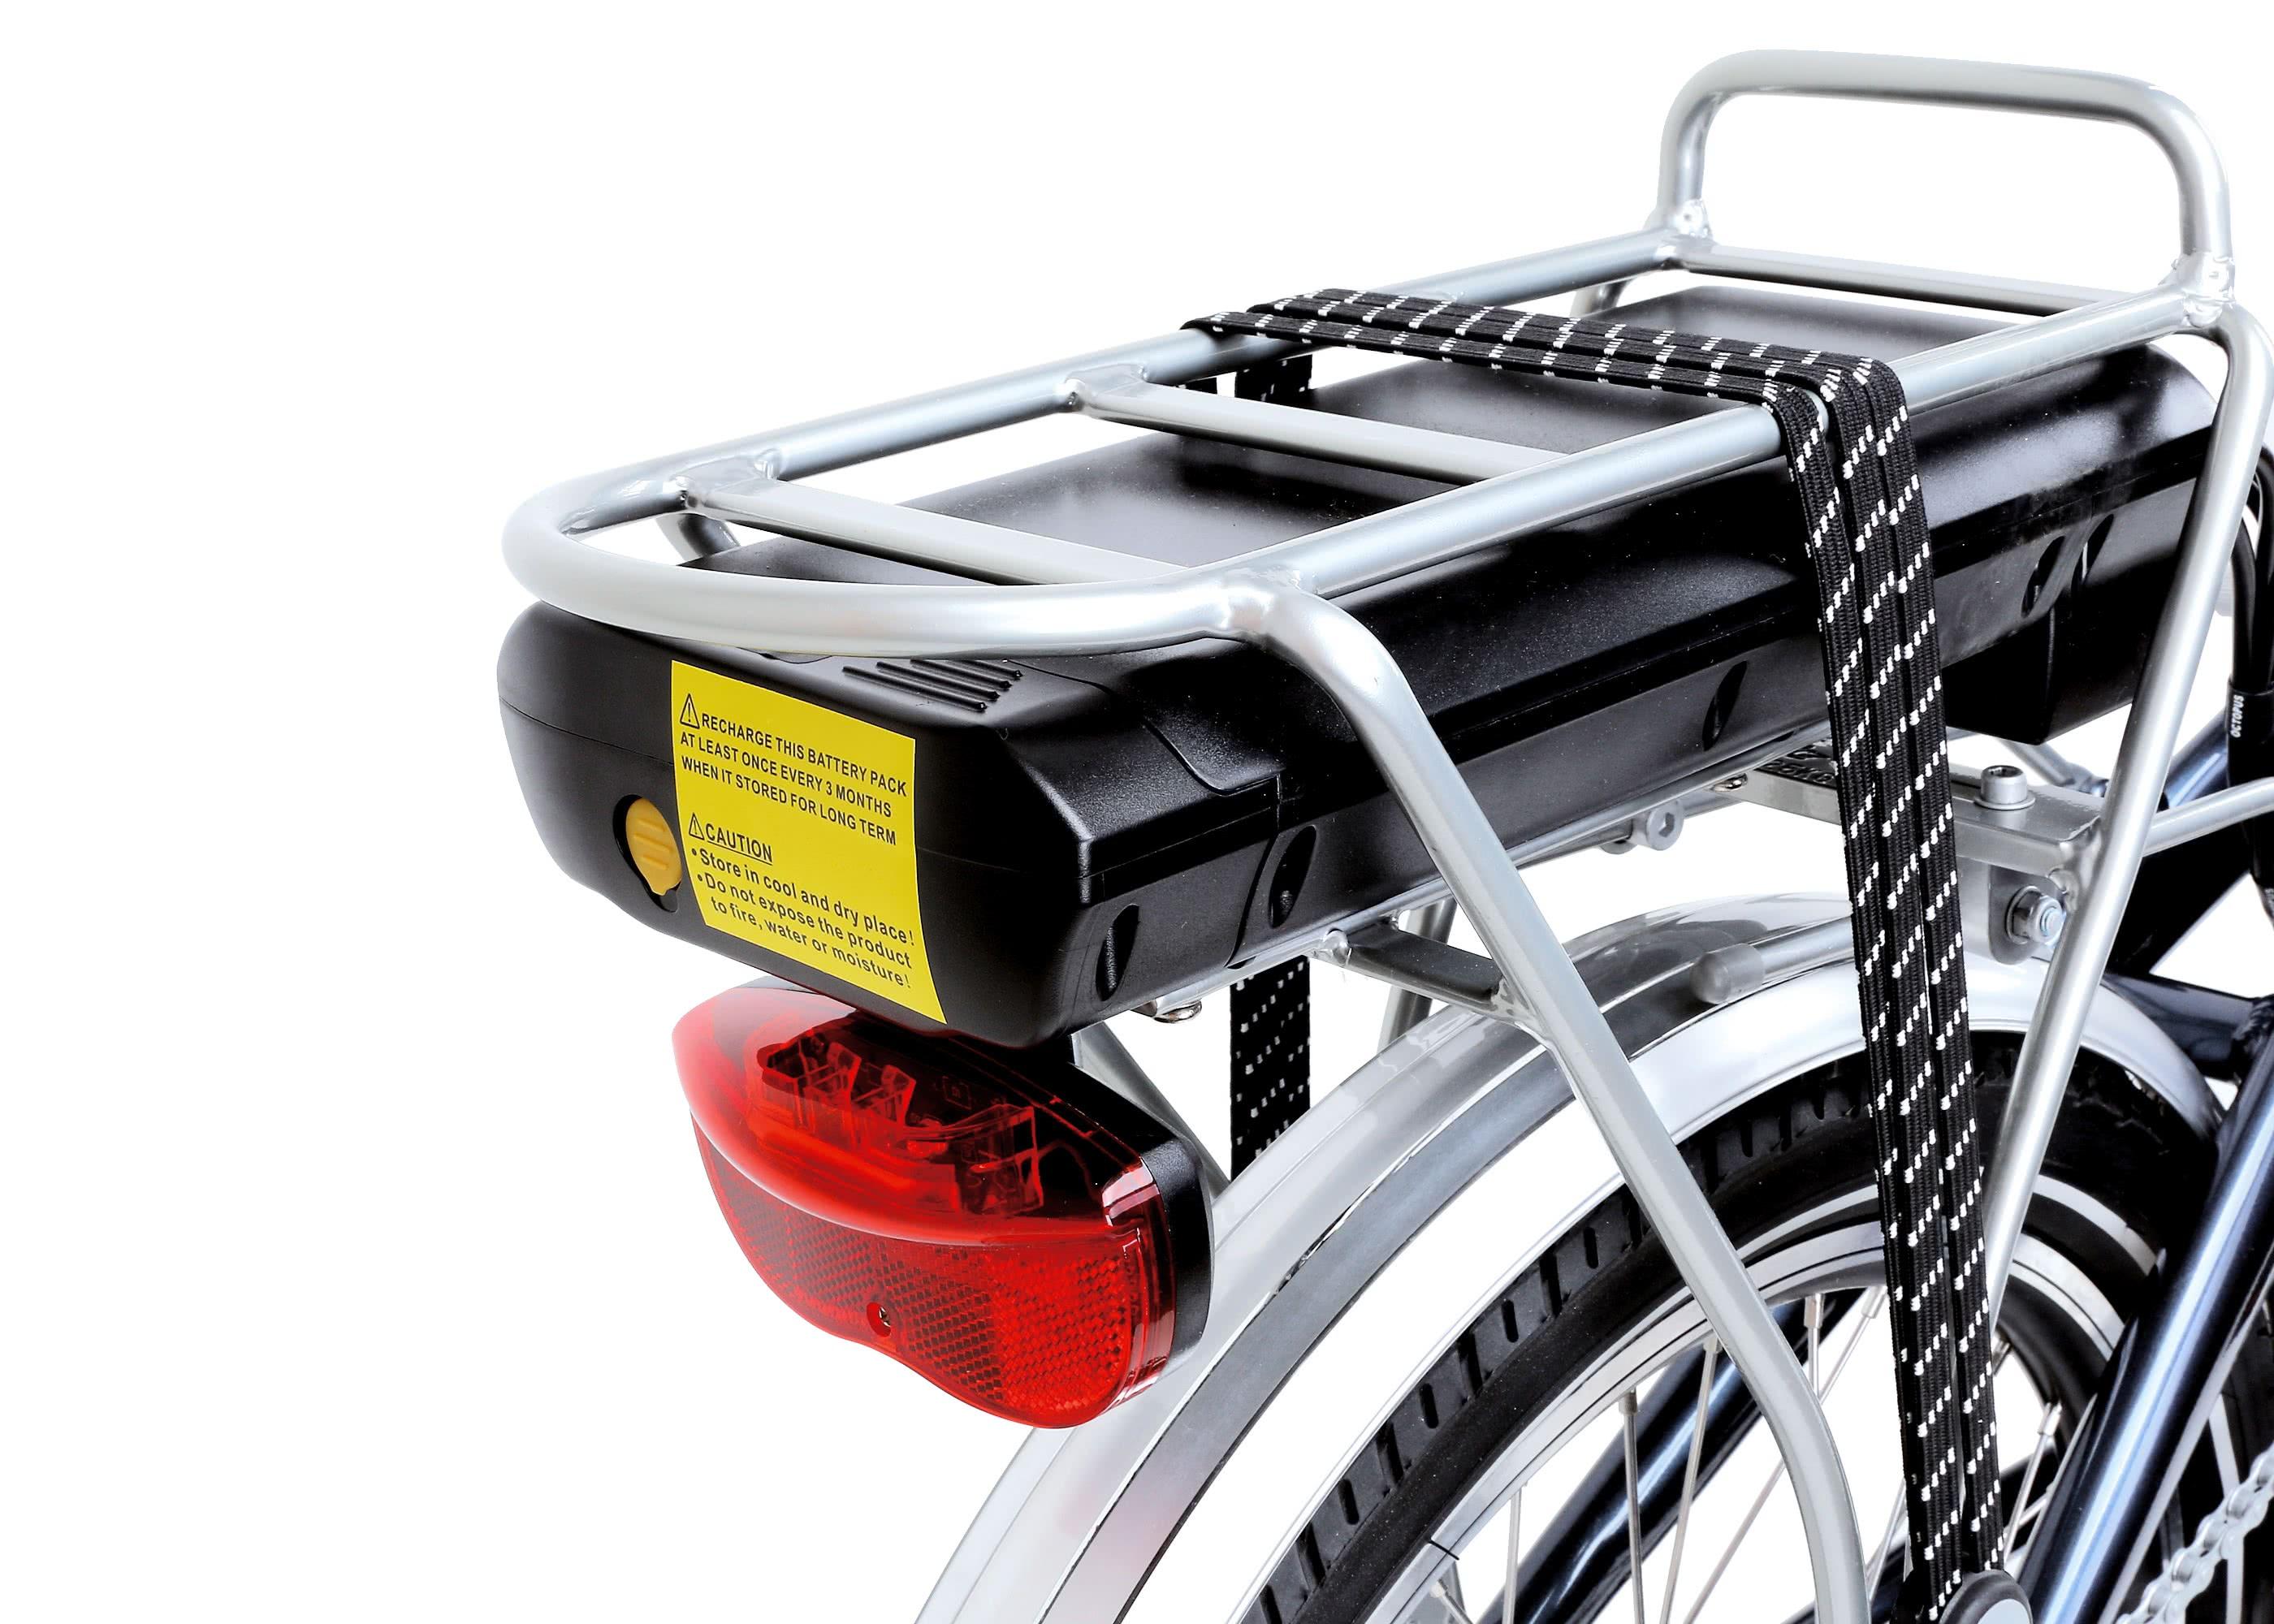 86092_SEATEC_Elektro-Bord-Fahrrad-BLIZZ_detail6.jpg